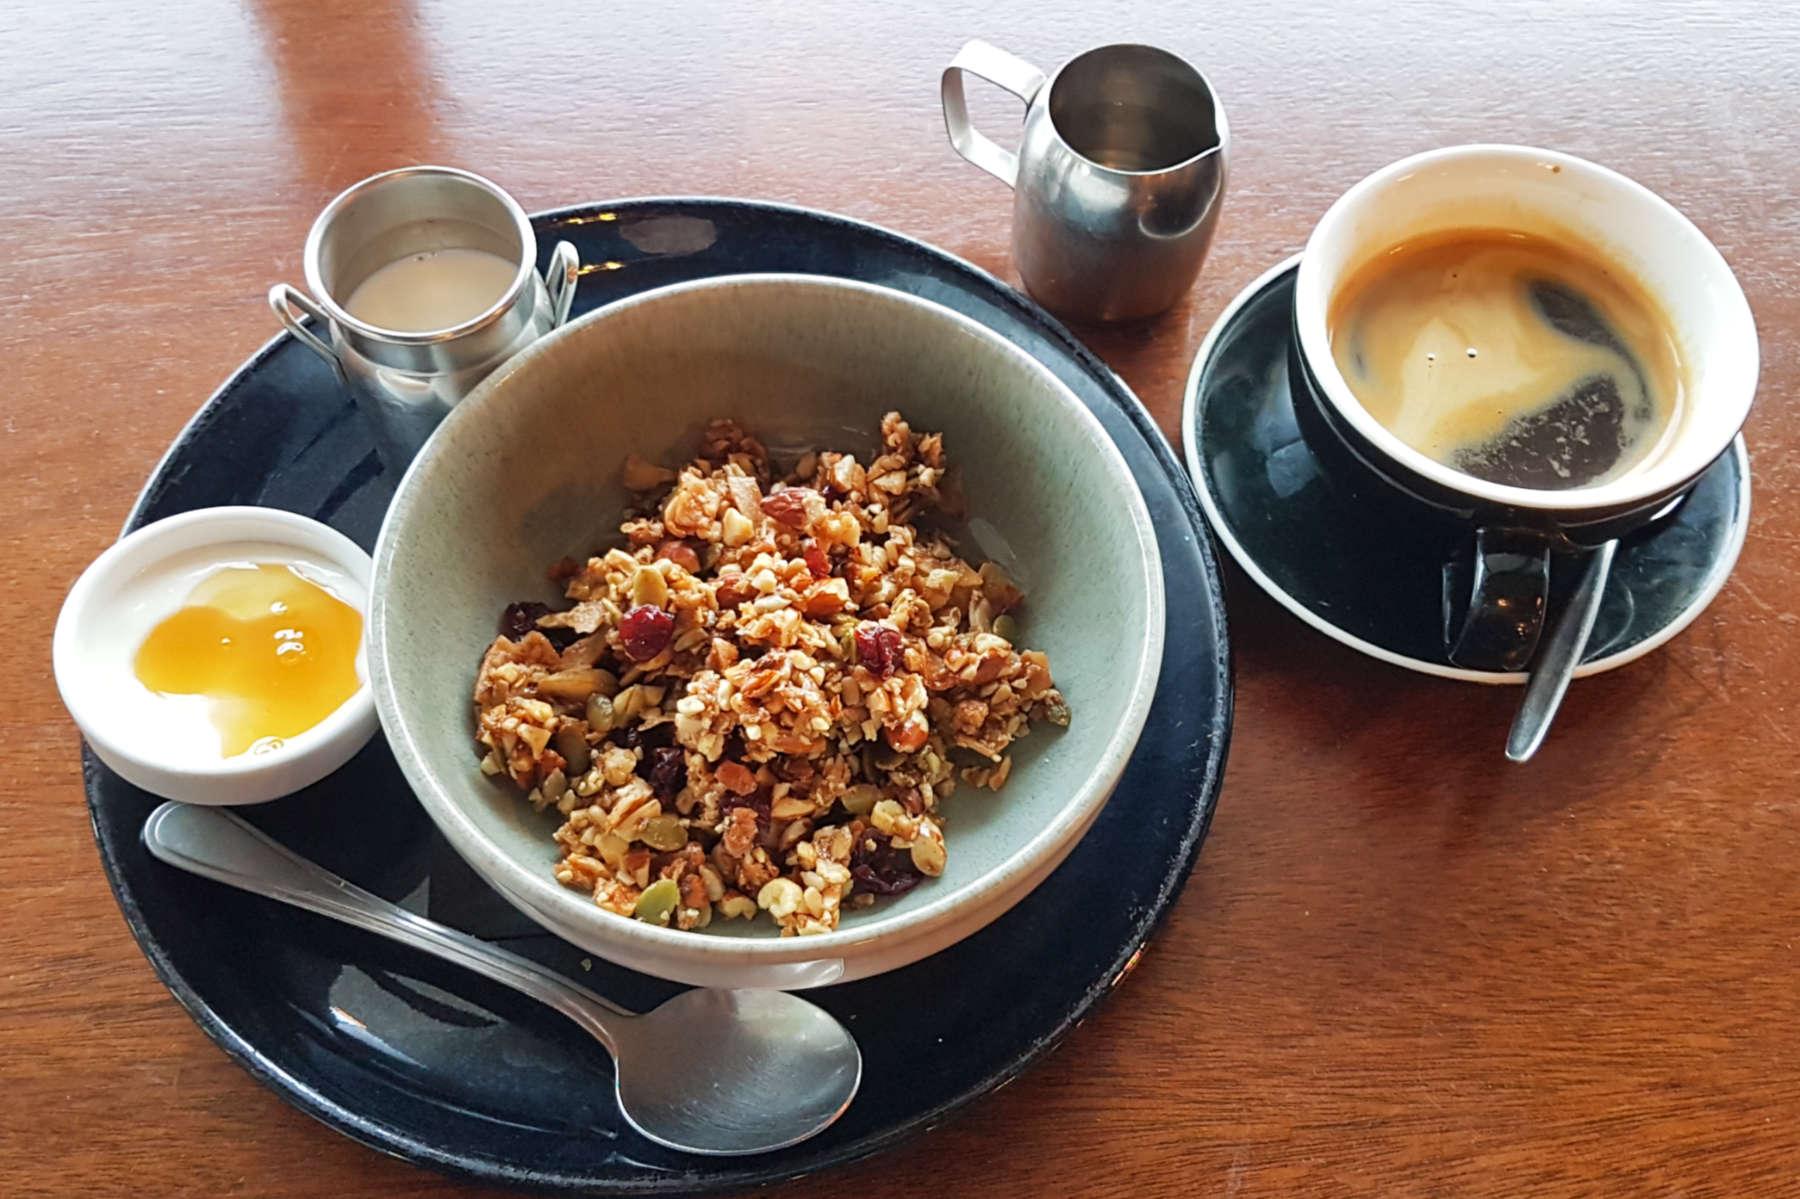 Faith & Co granola and coffee